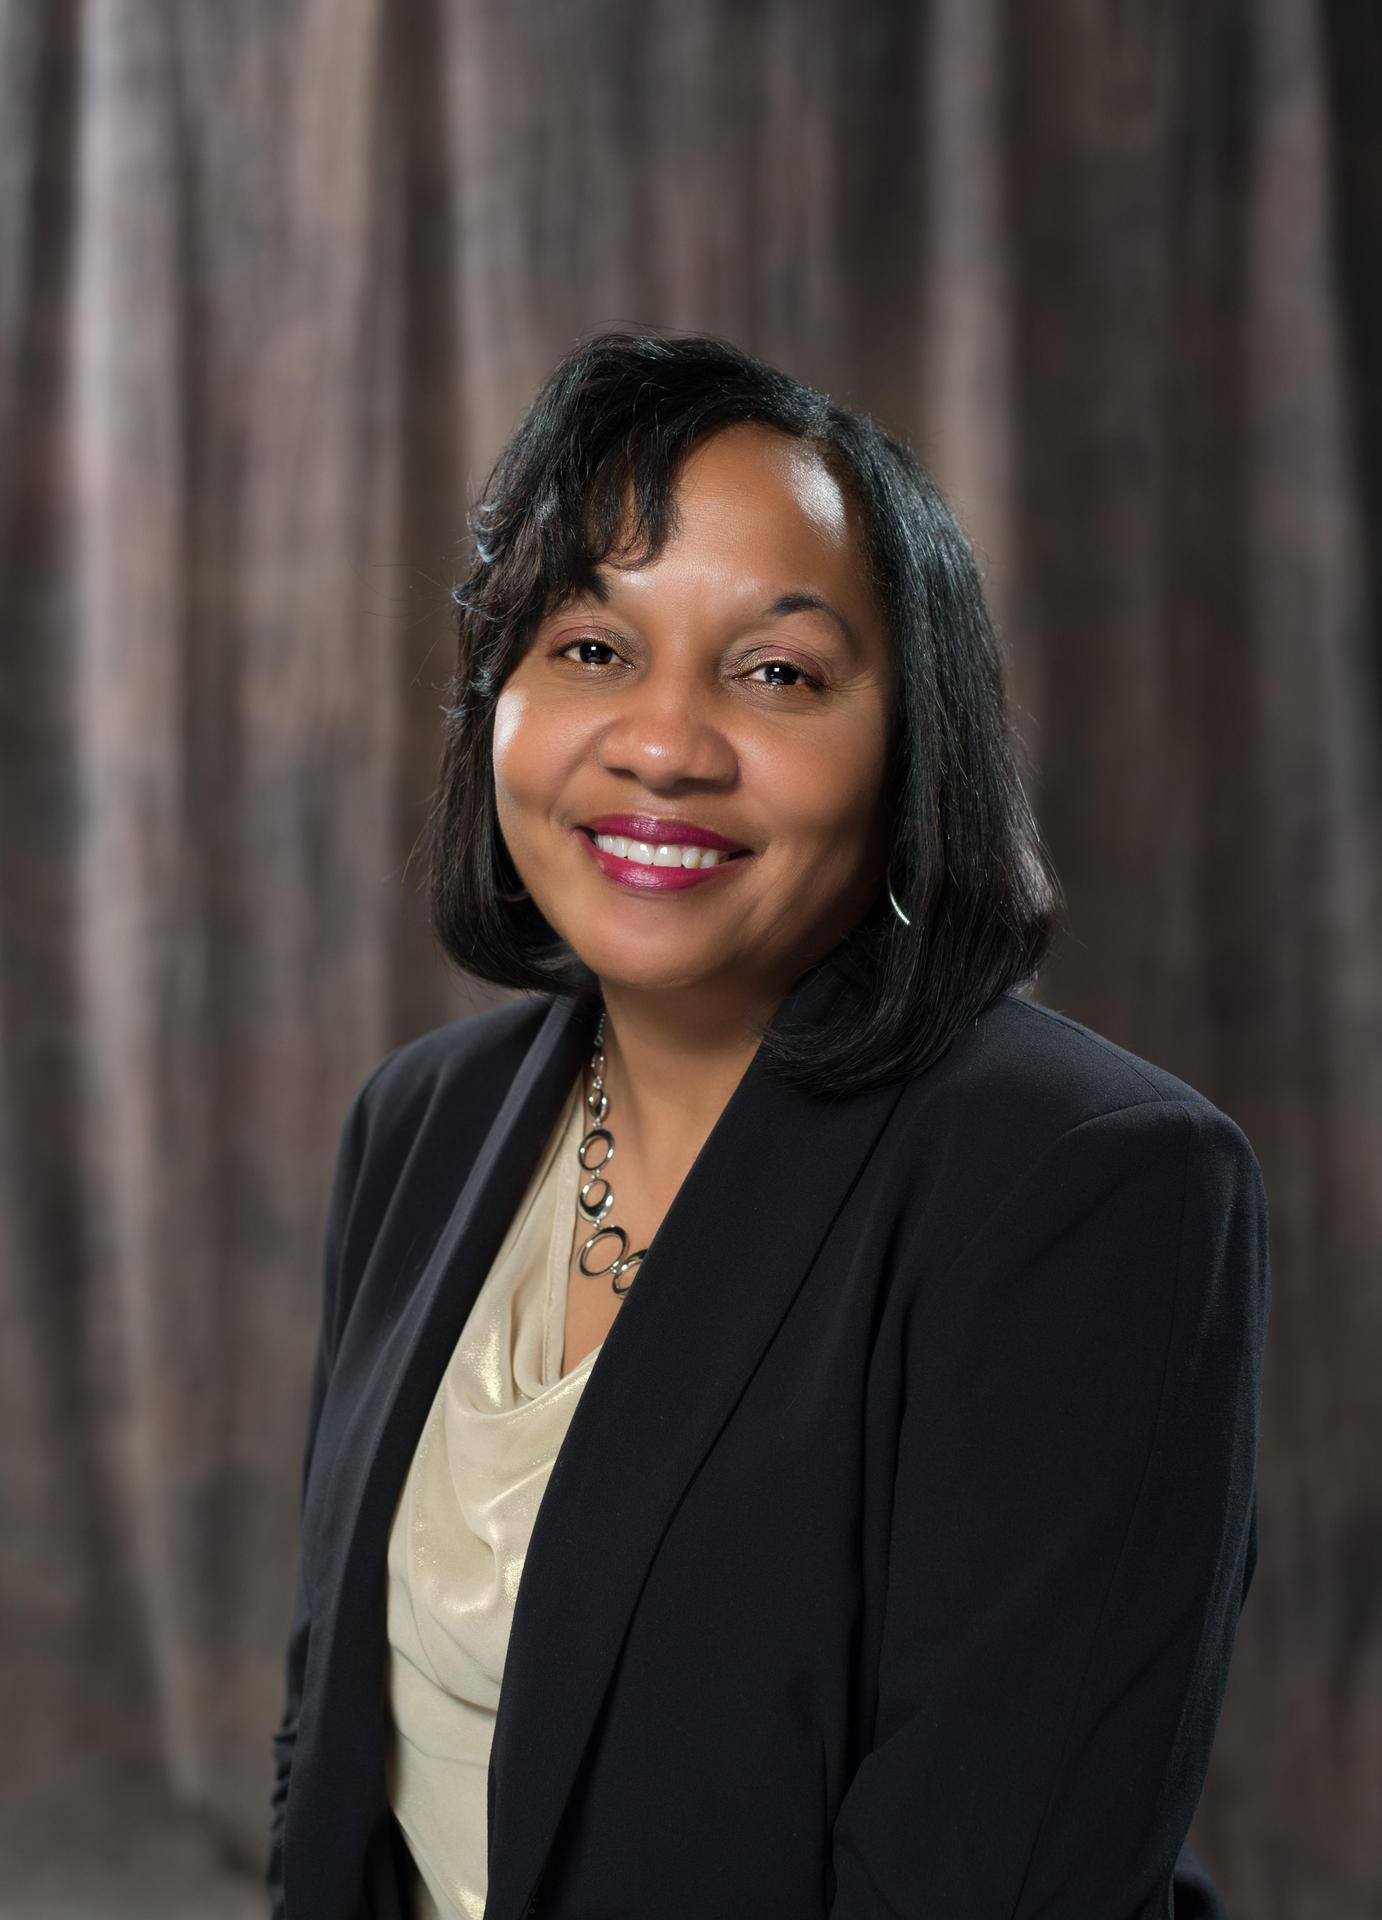 Dr. Janice Richardson